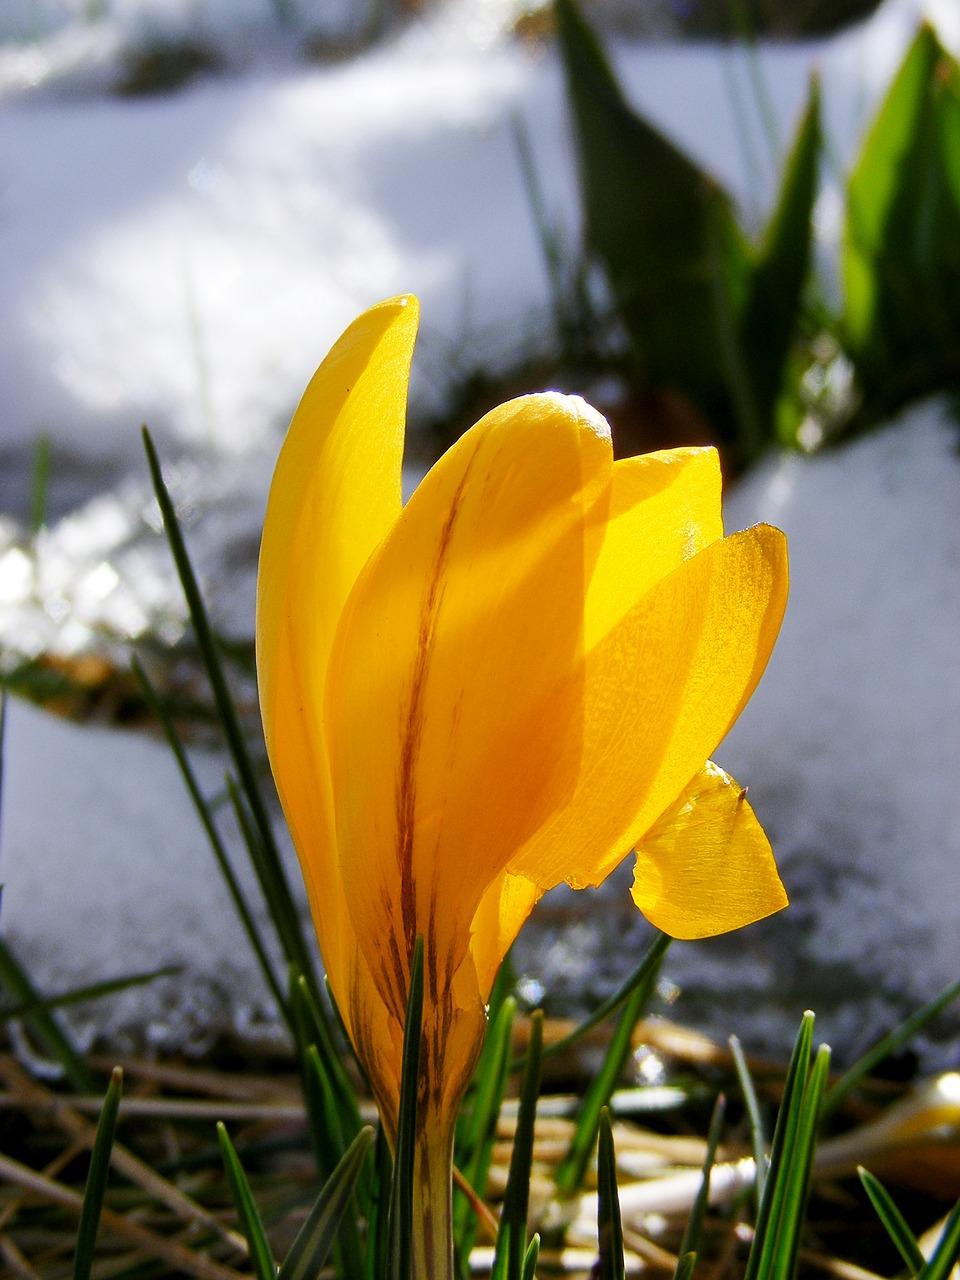 Crocusyellowbloomspringflower Free Photo From Needpix